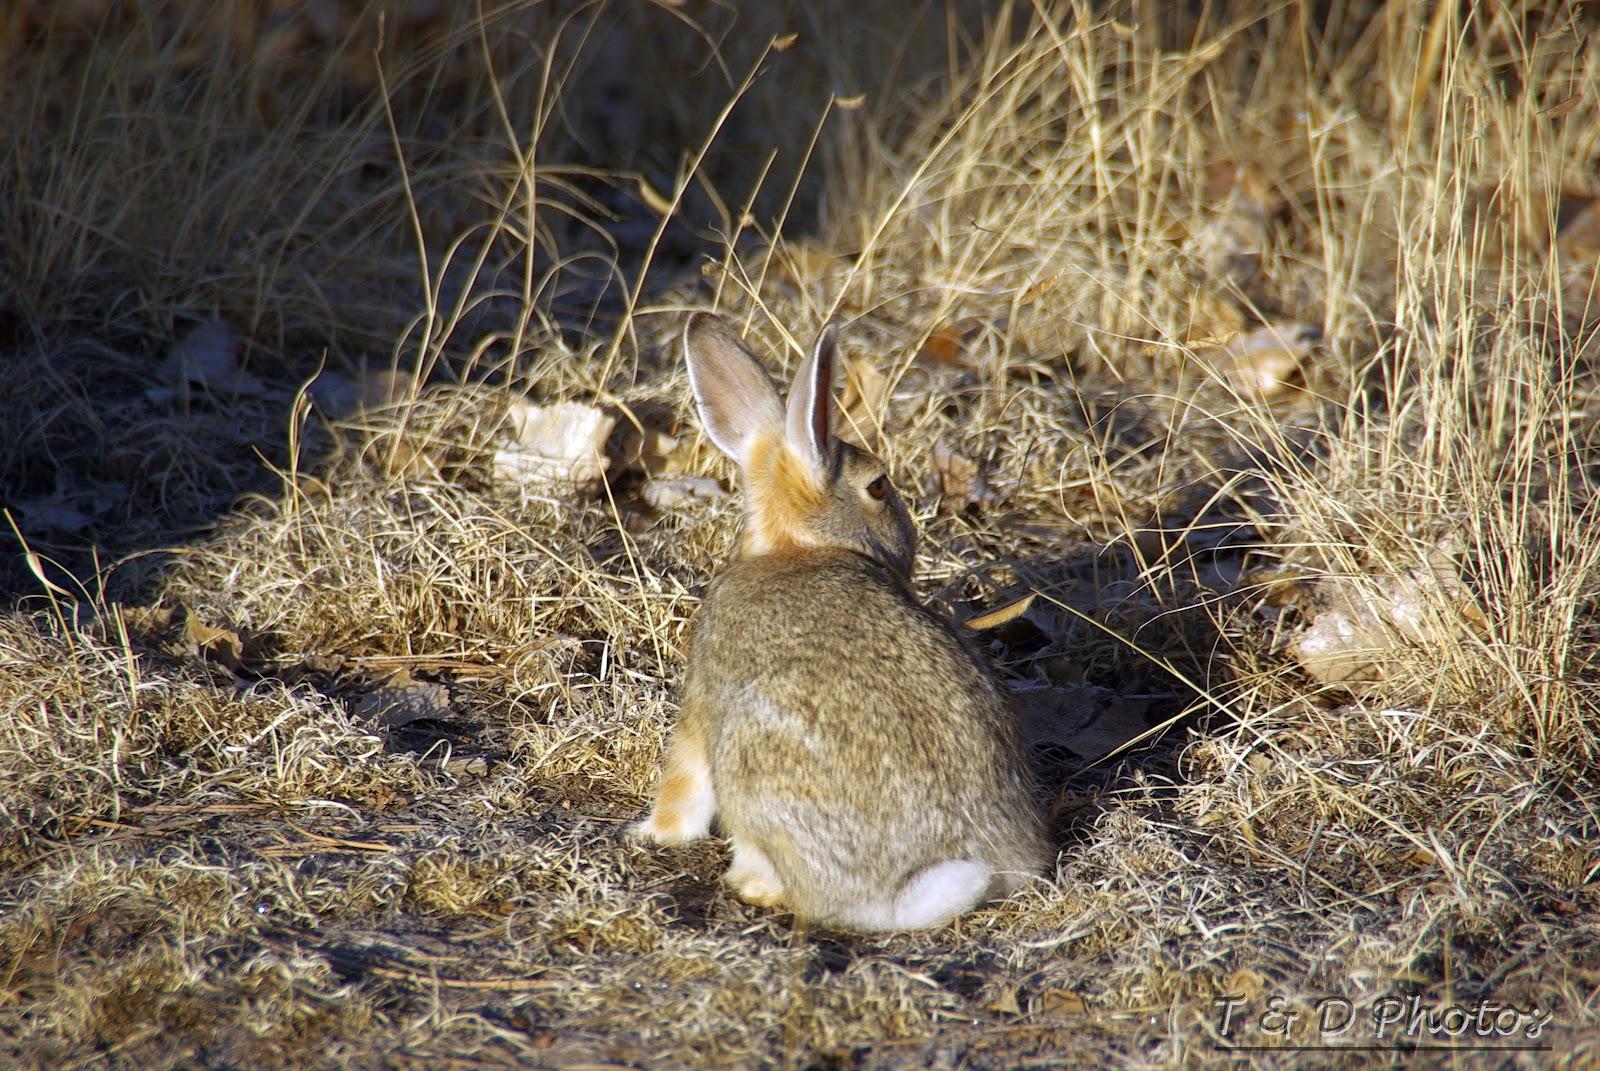 Cottontail rabbit habitat - photo#2